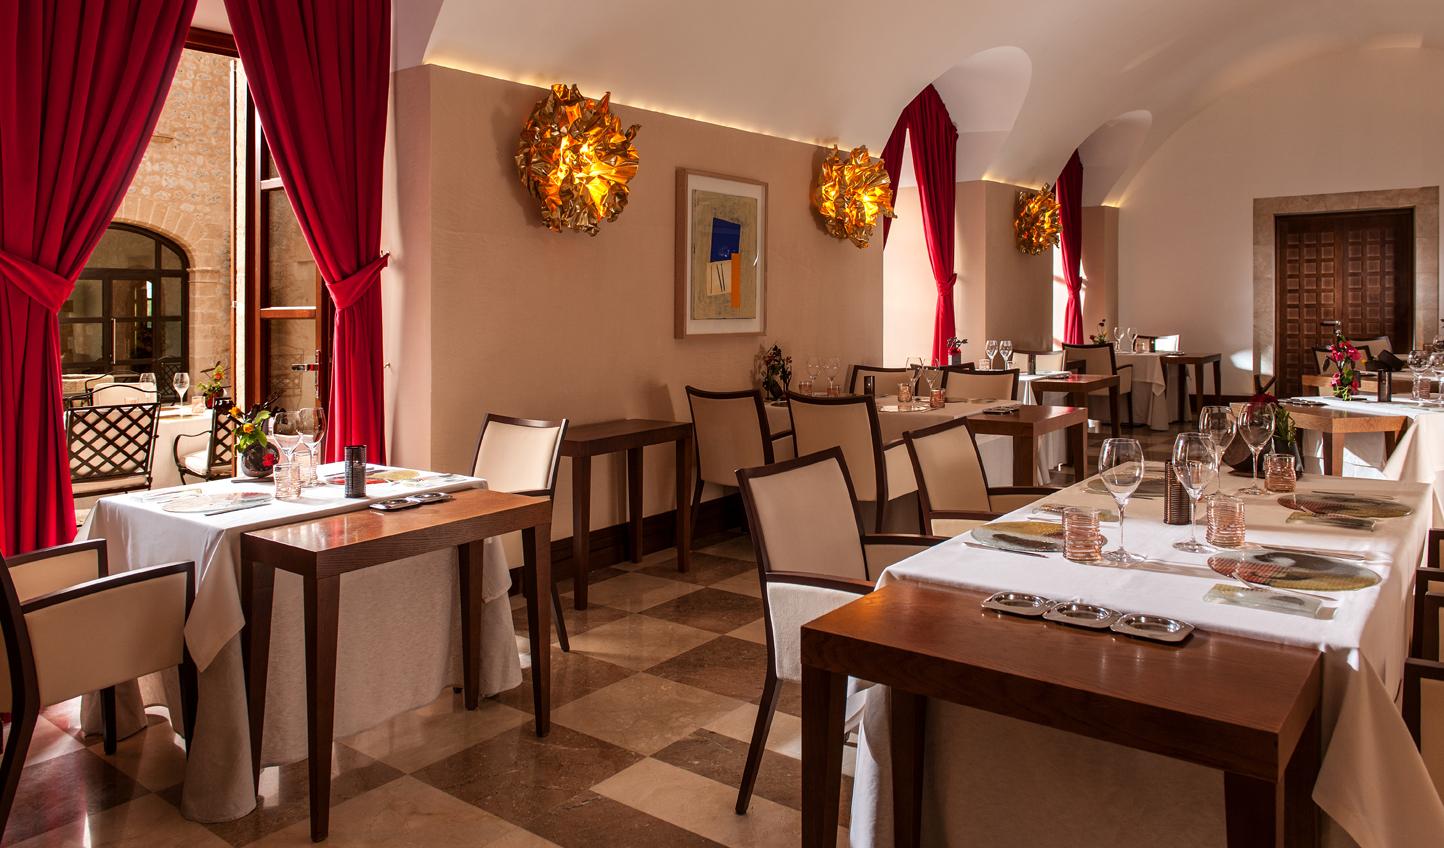 Indulge in two Michelin starred dining at Zaranda